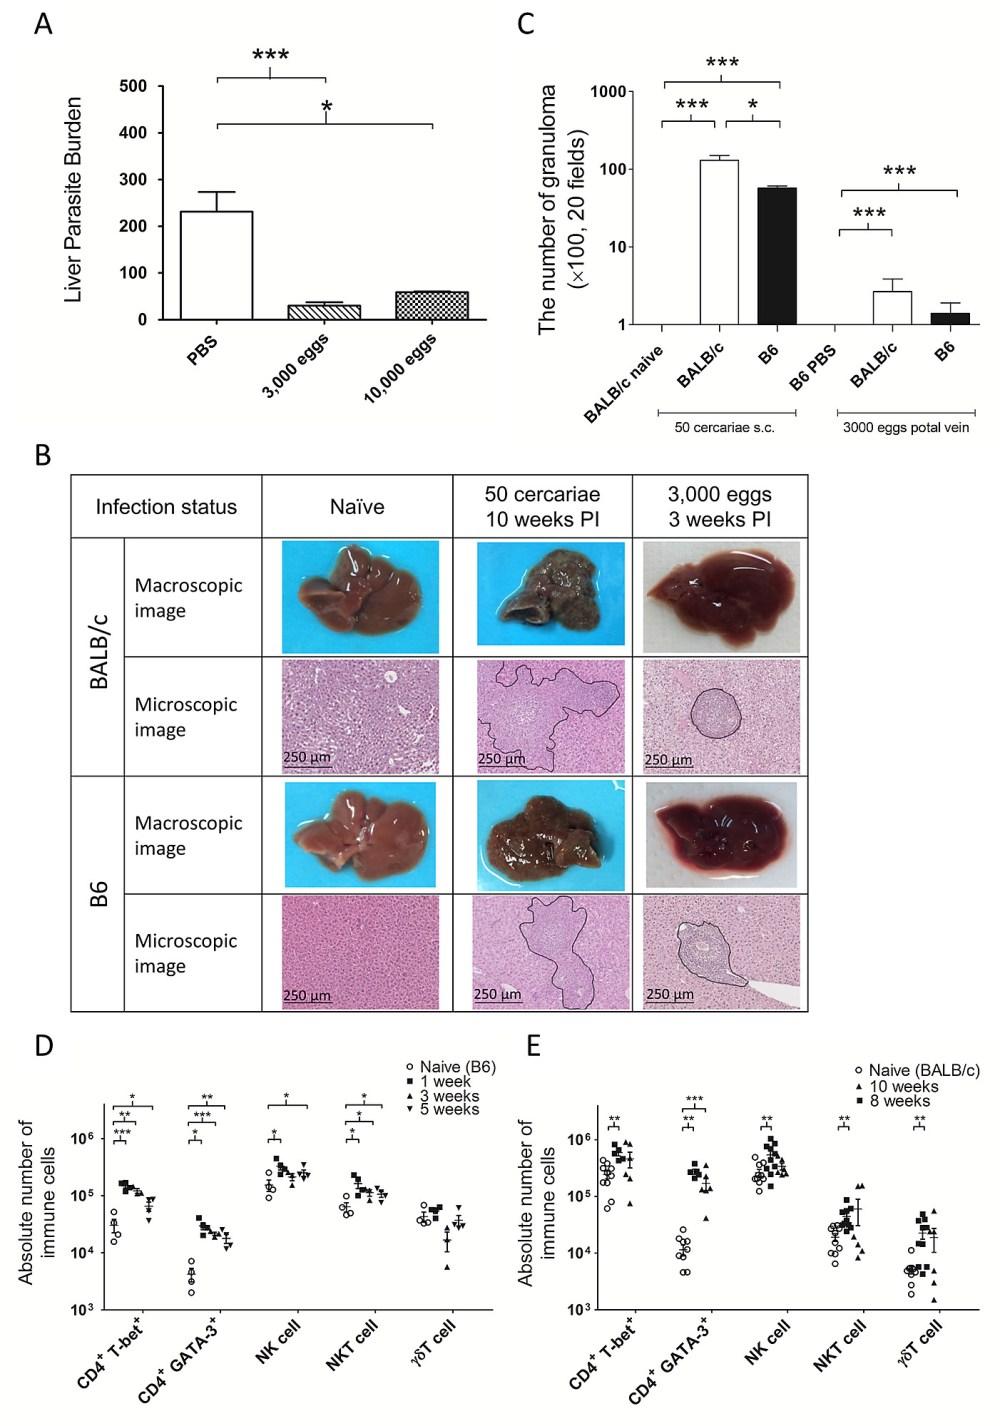 medium resolution of liver immunopathology in schistosoma mansoni cercariae infection and intraportal infusion of frozen s mansoni eggs